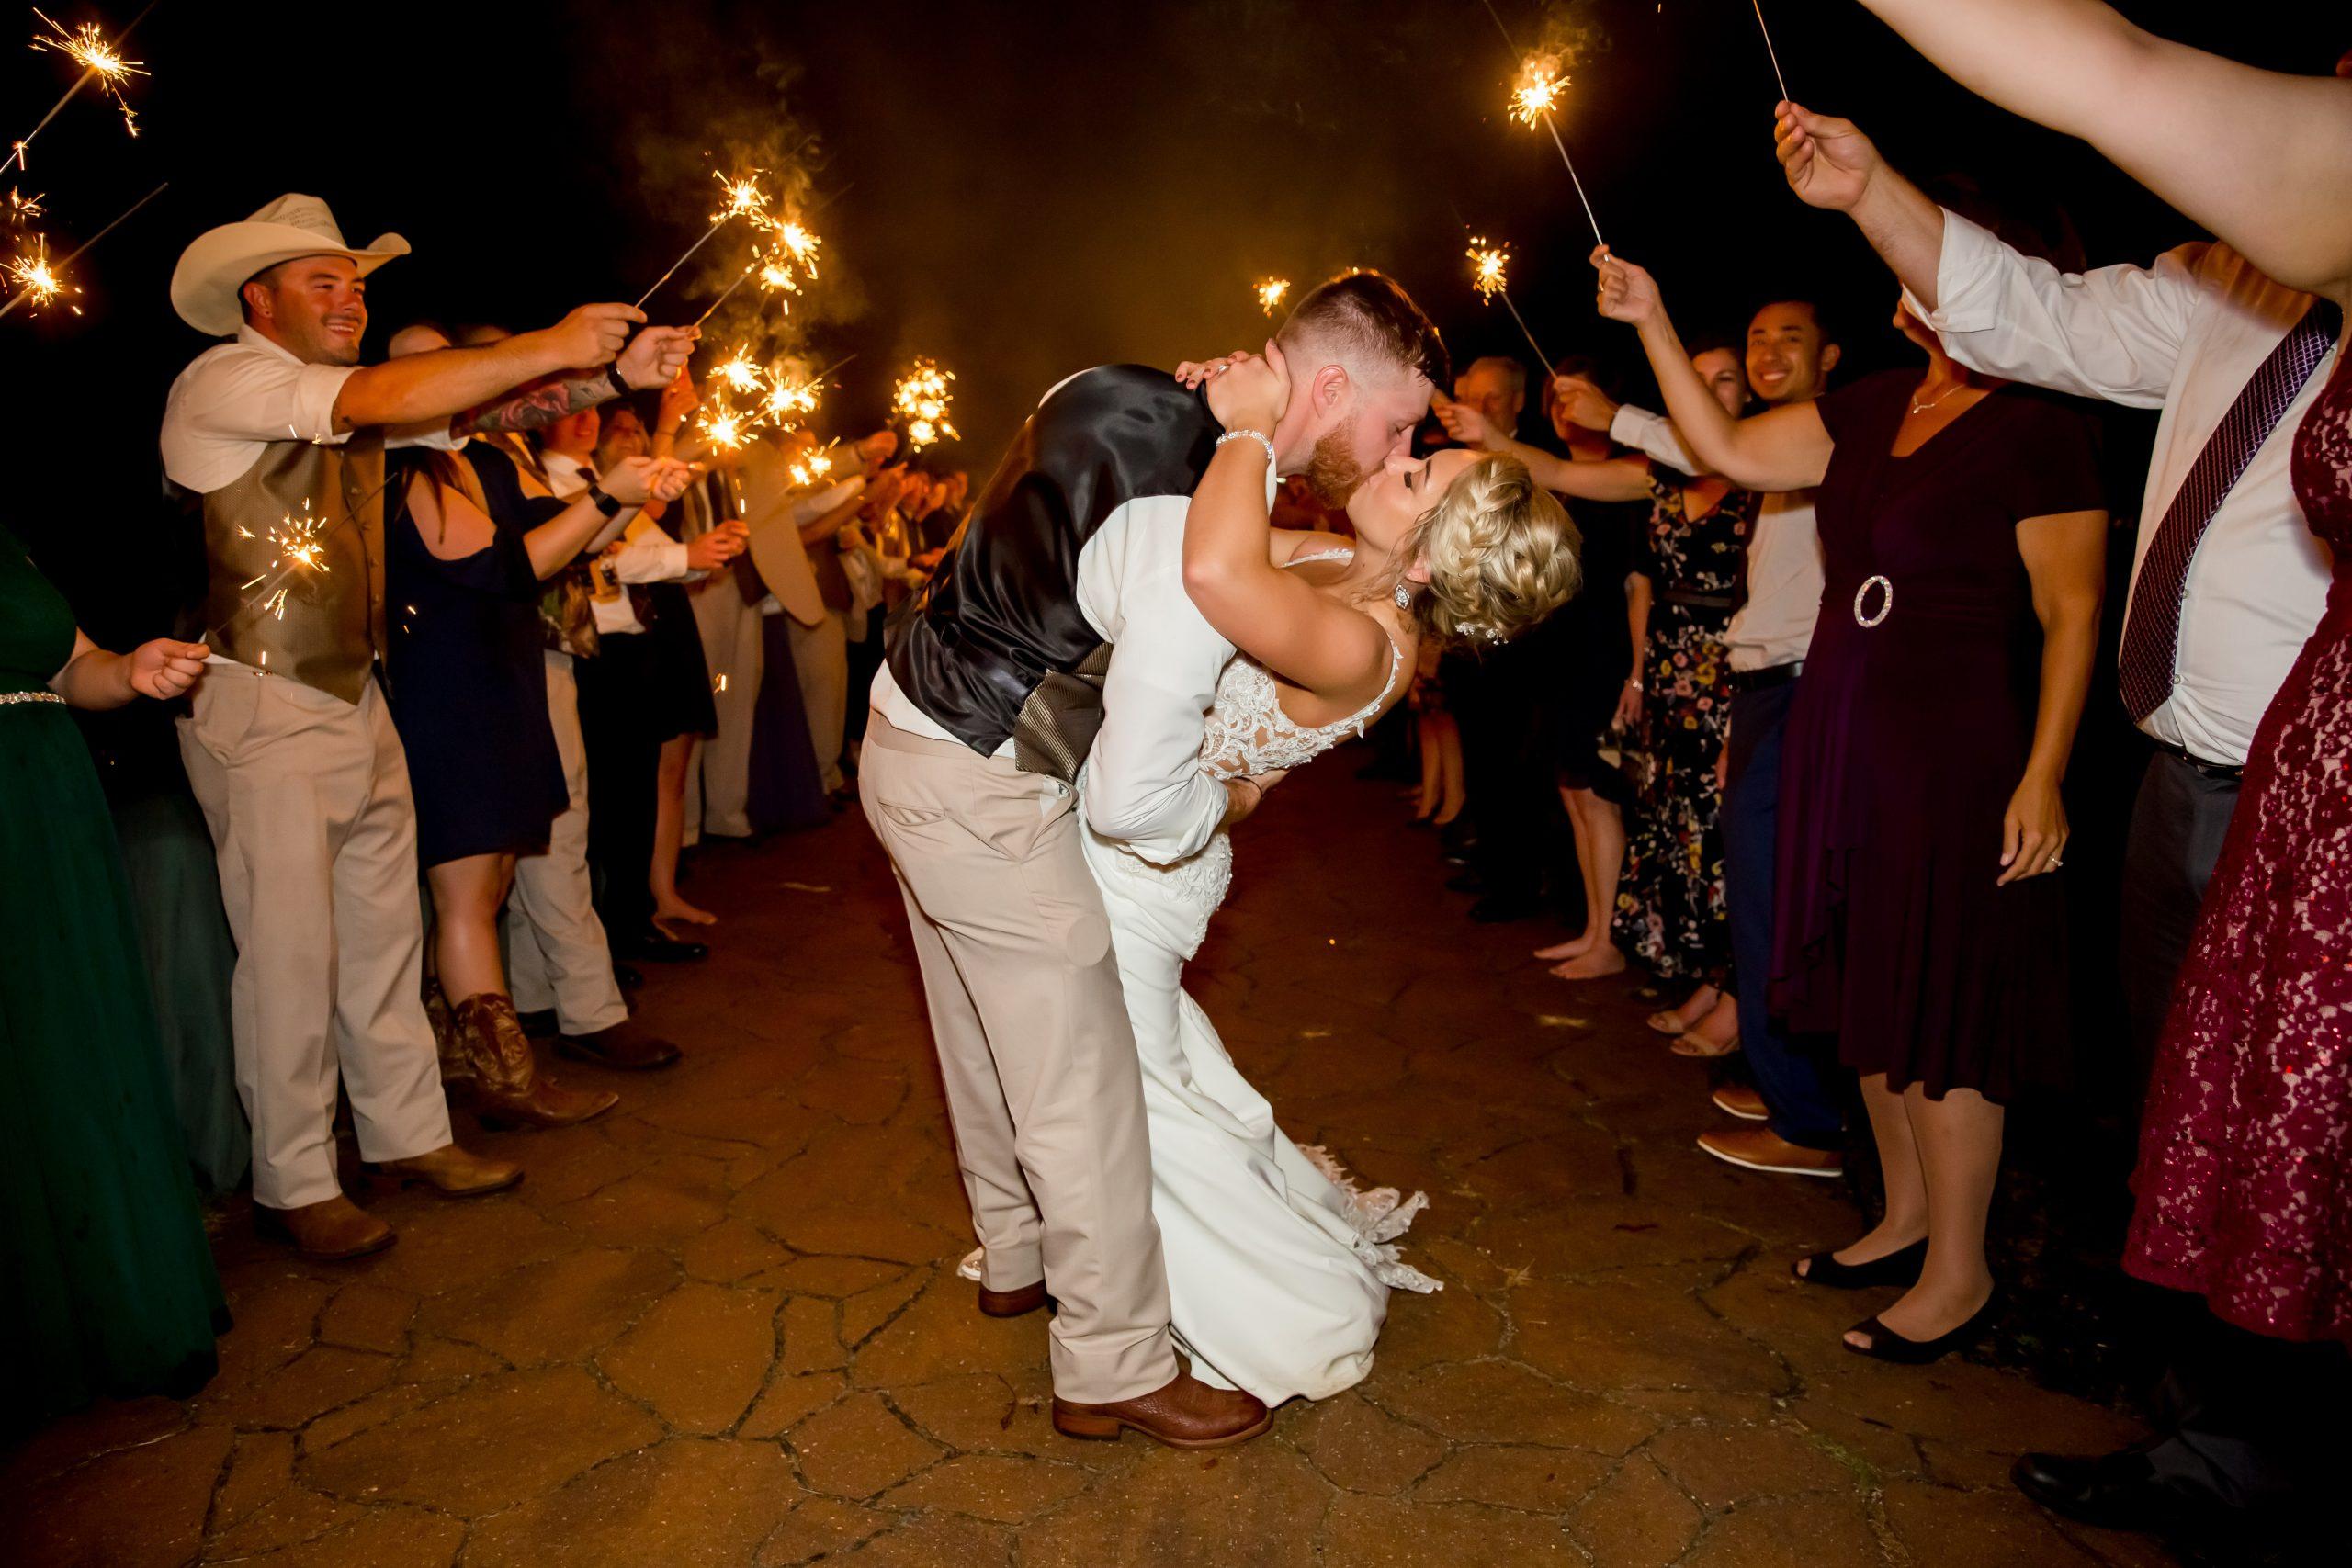 liberty_ridge_wedding28.jpg